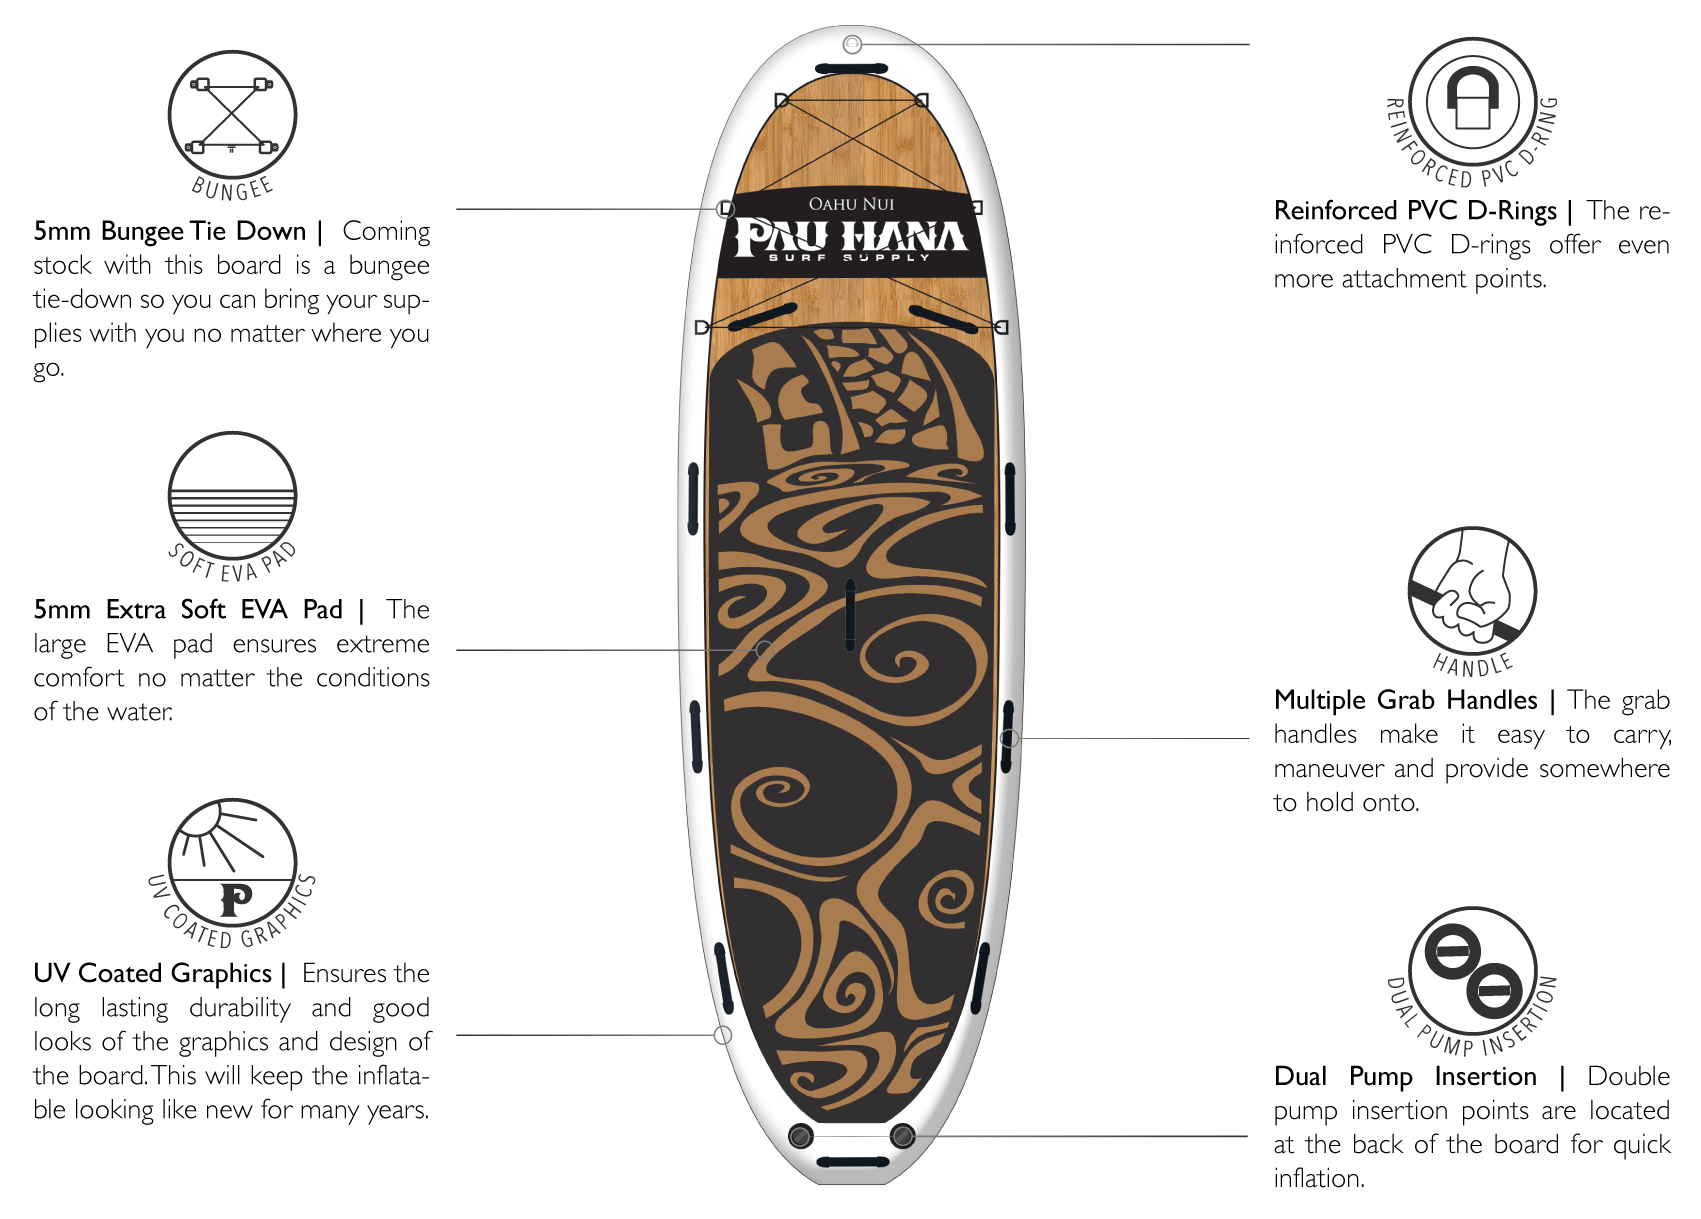 Oahu Nui Features